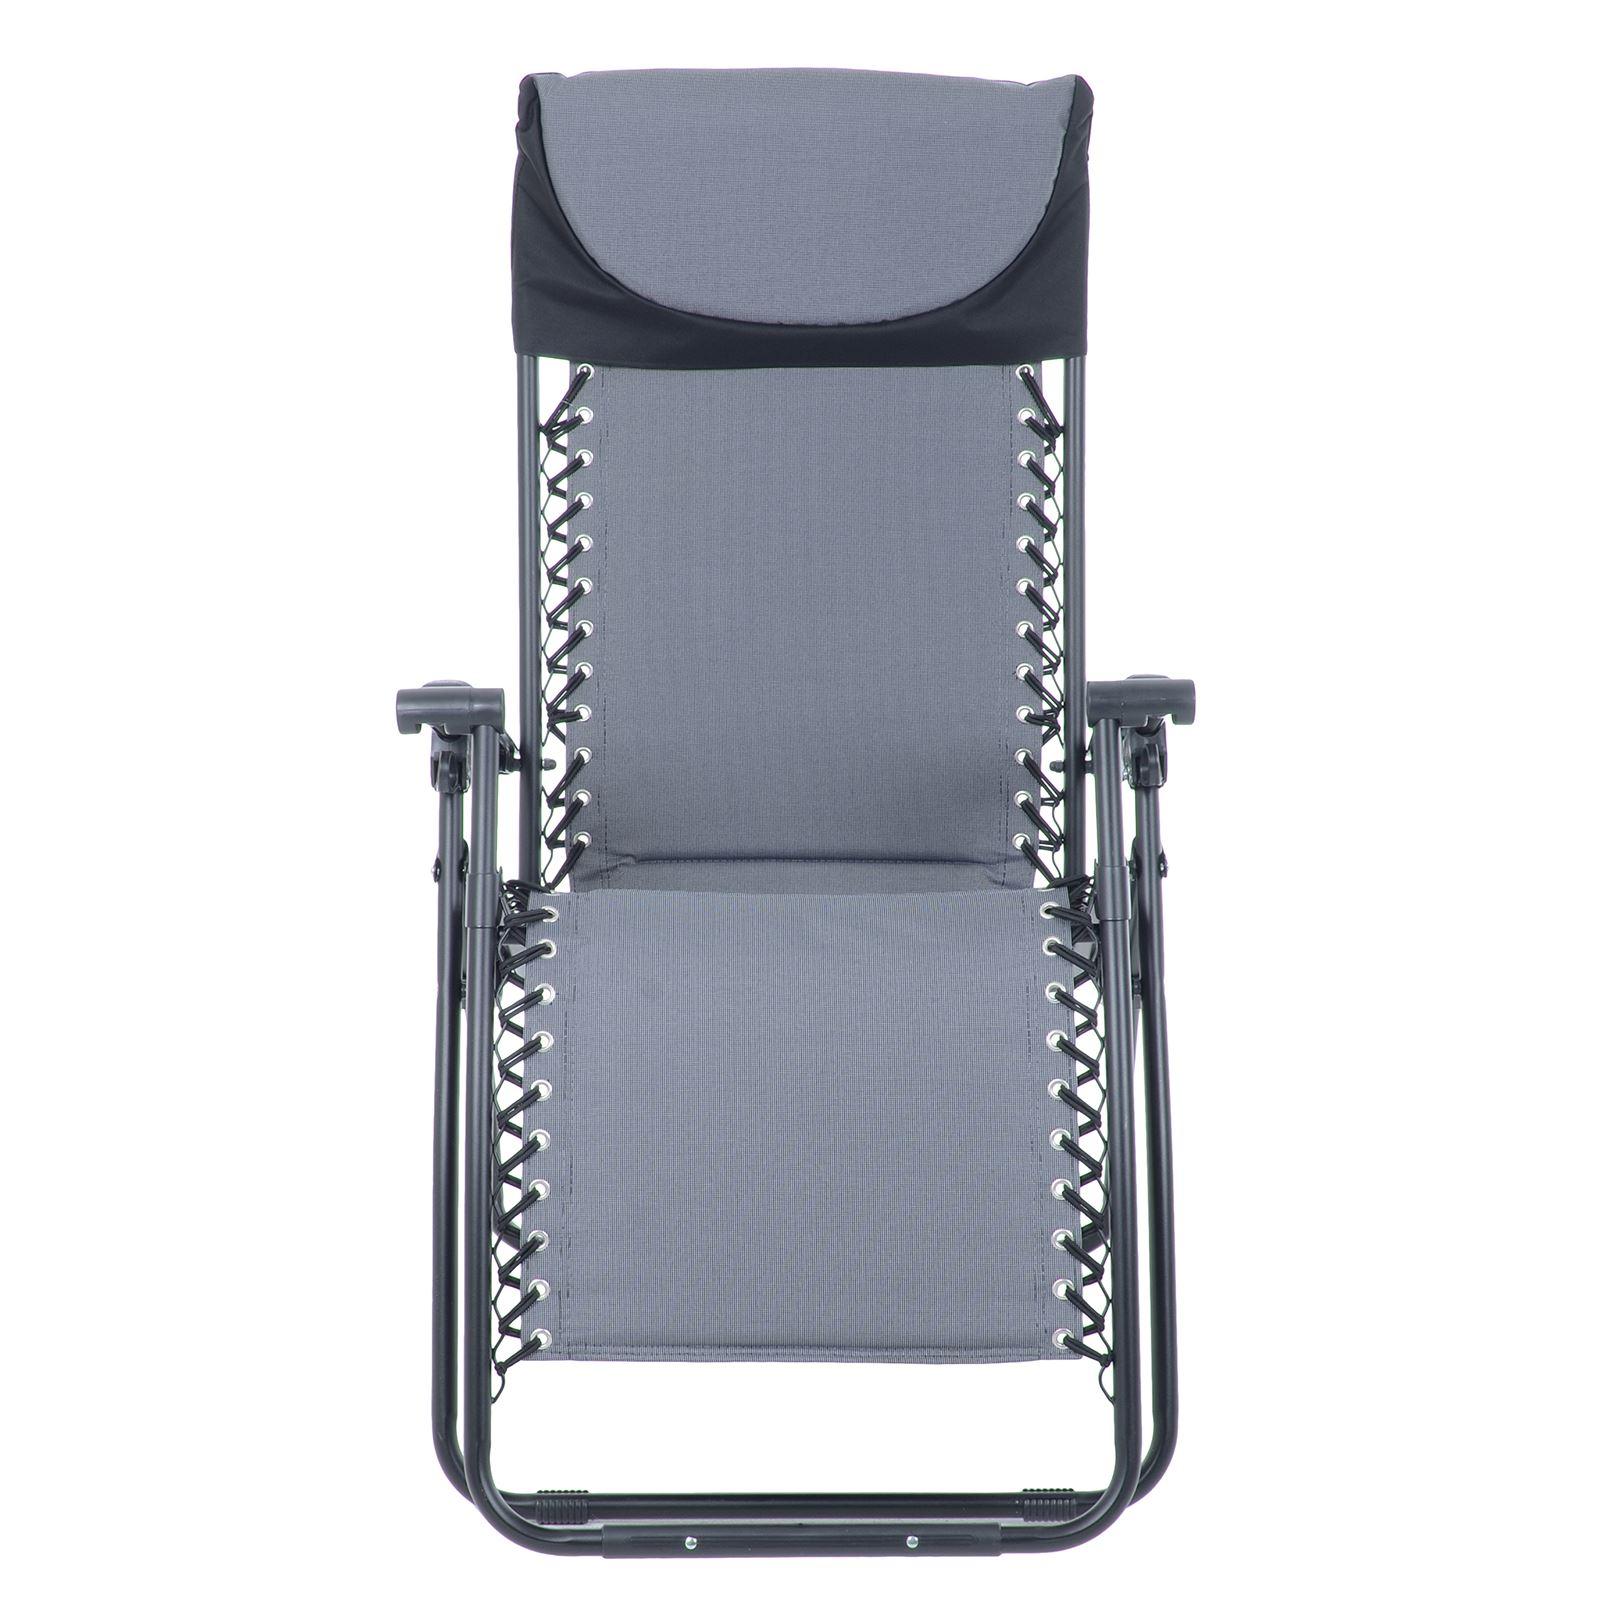 Azuma Zero Gravity Padded Relaxer Chair Reclining Garden Multi Position Lounger